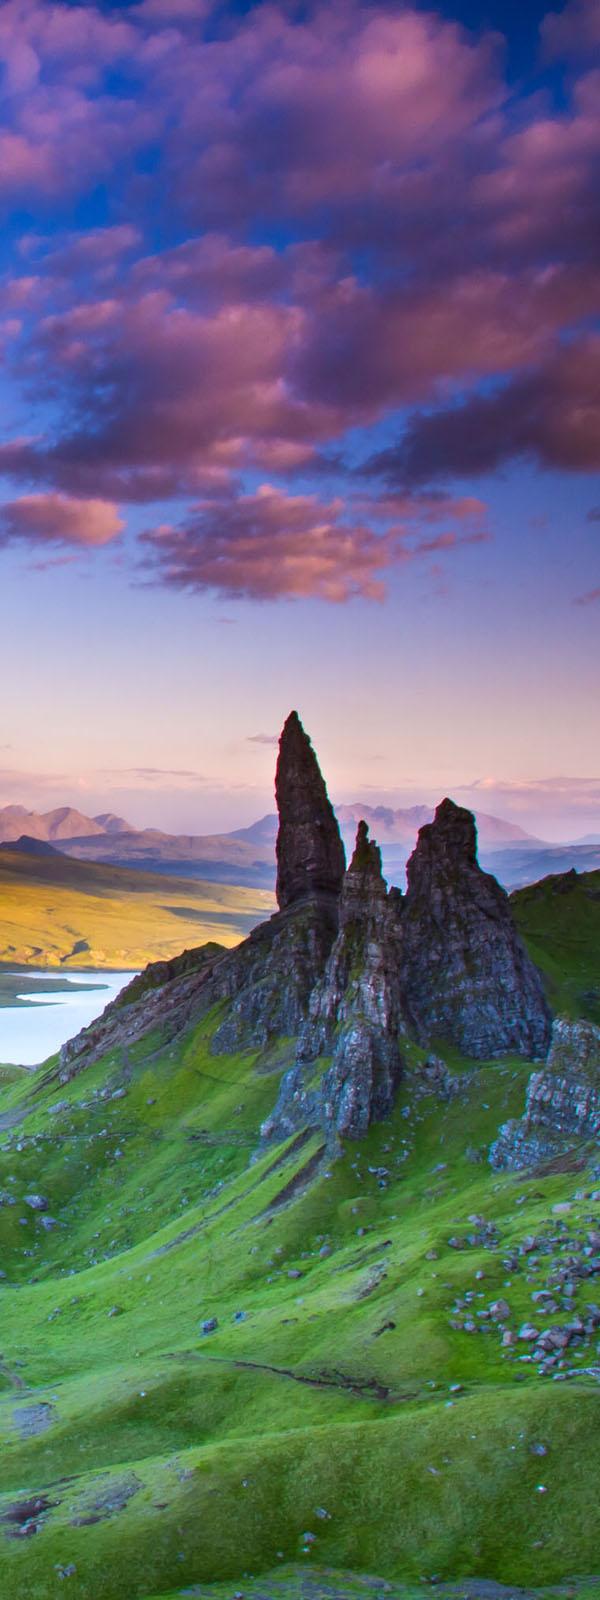 Old Man of Storr Rock, Scotland